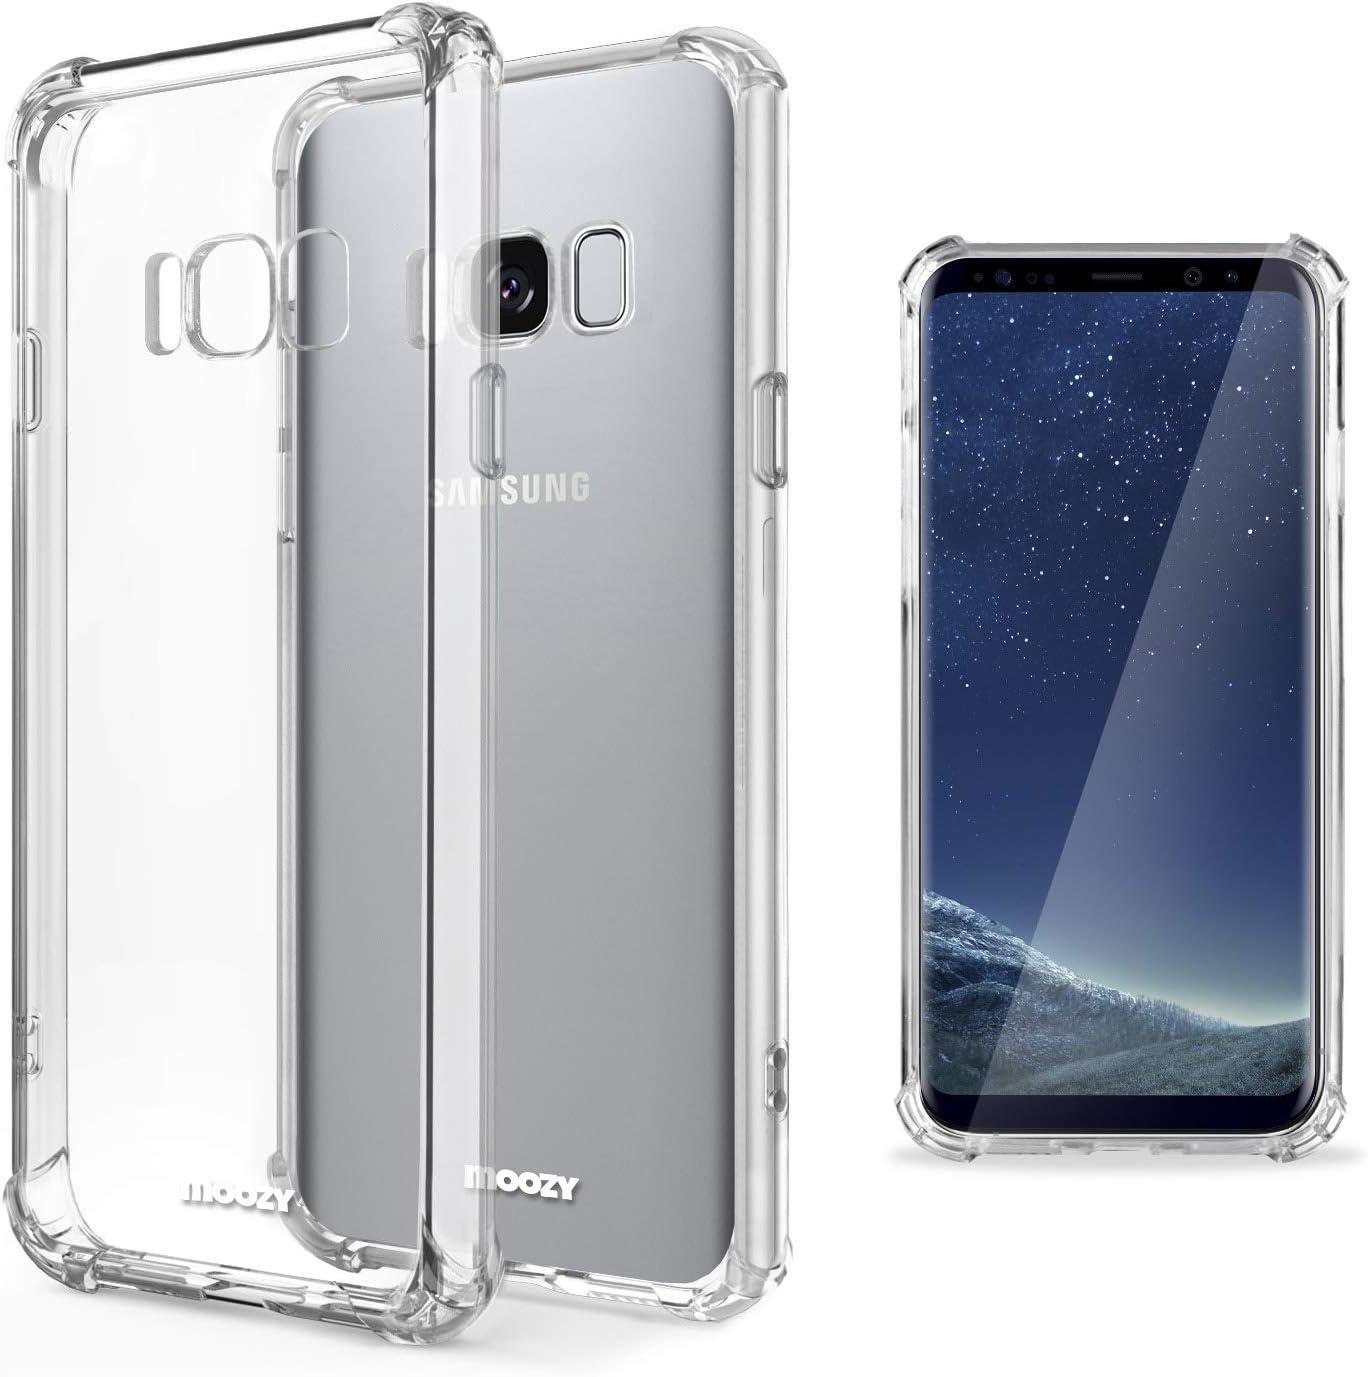 Moozy Funda Silicona Antigolpes para Samsung S8 Plus: Amazon.es ...